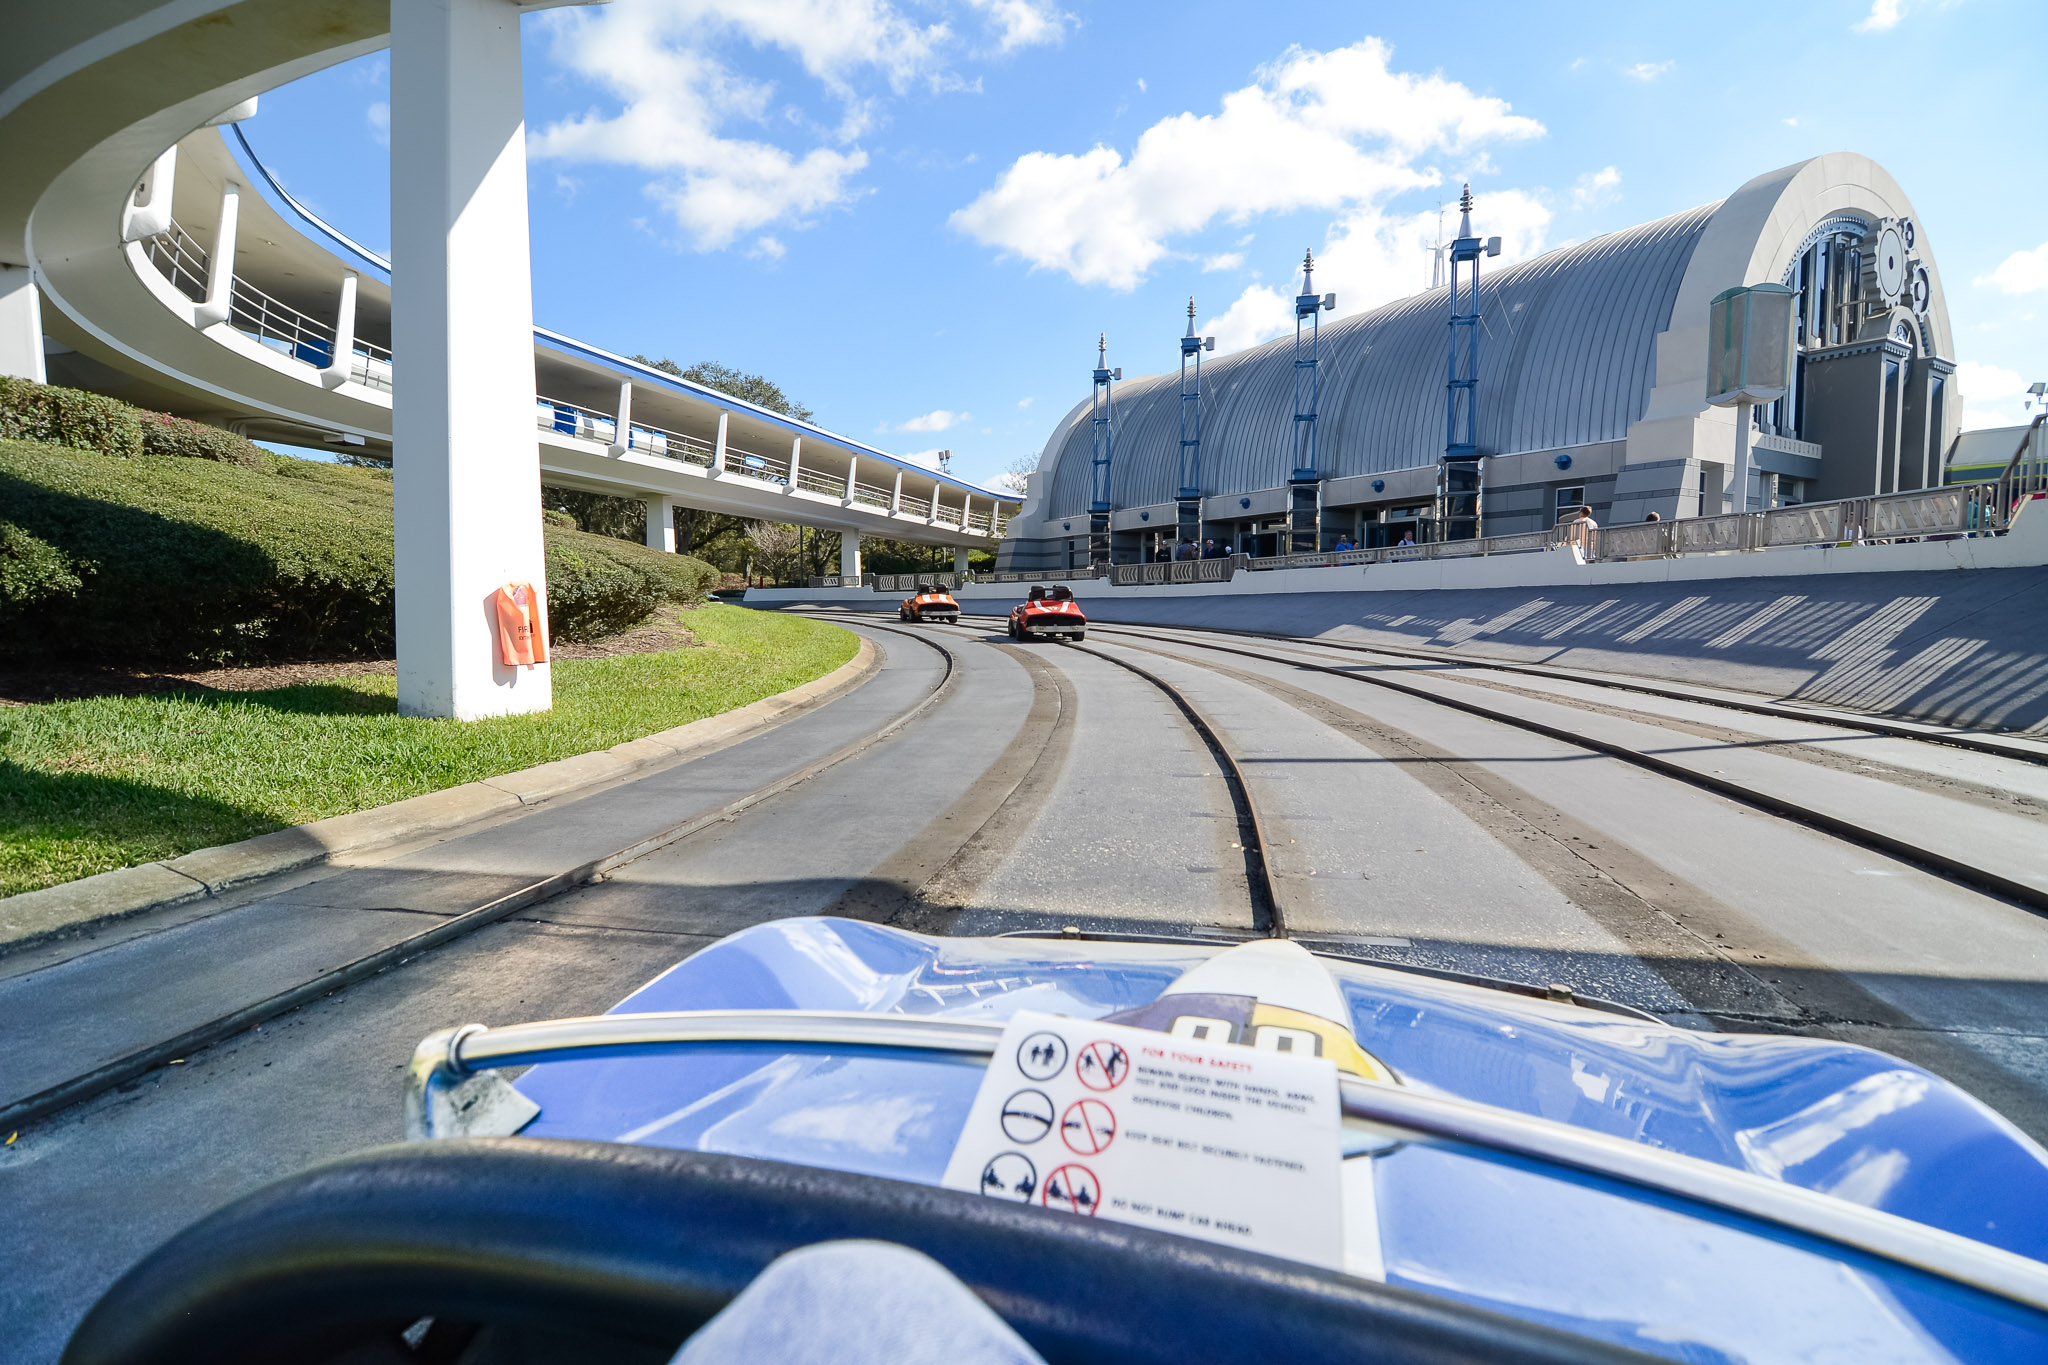 Tomorrowland Speedway Car - Walt Disney World Magic Kingdom